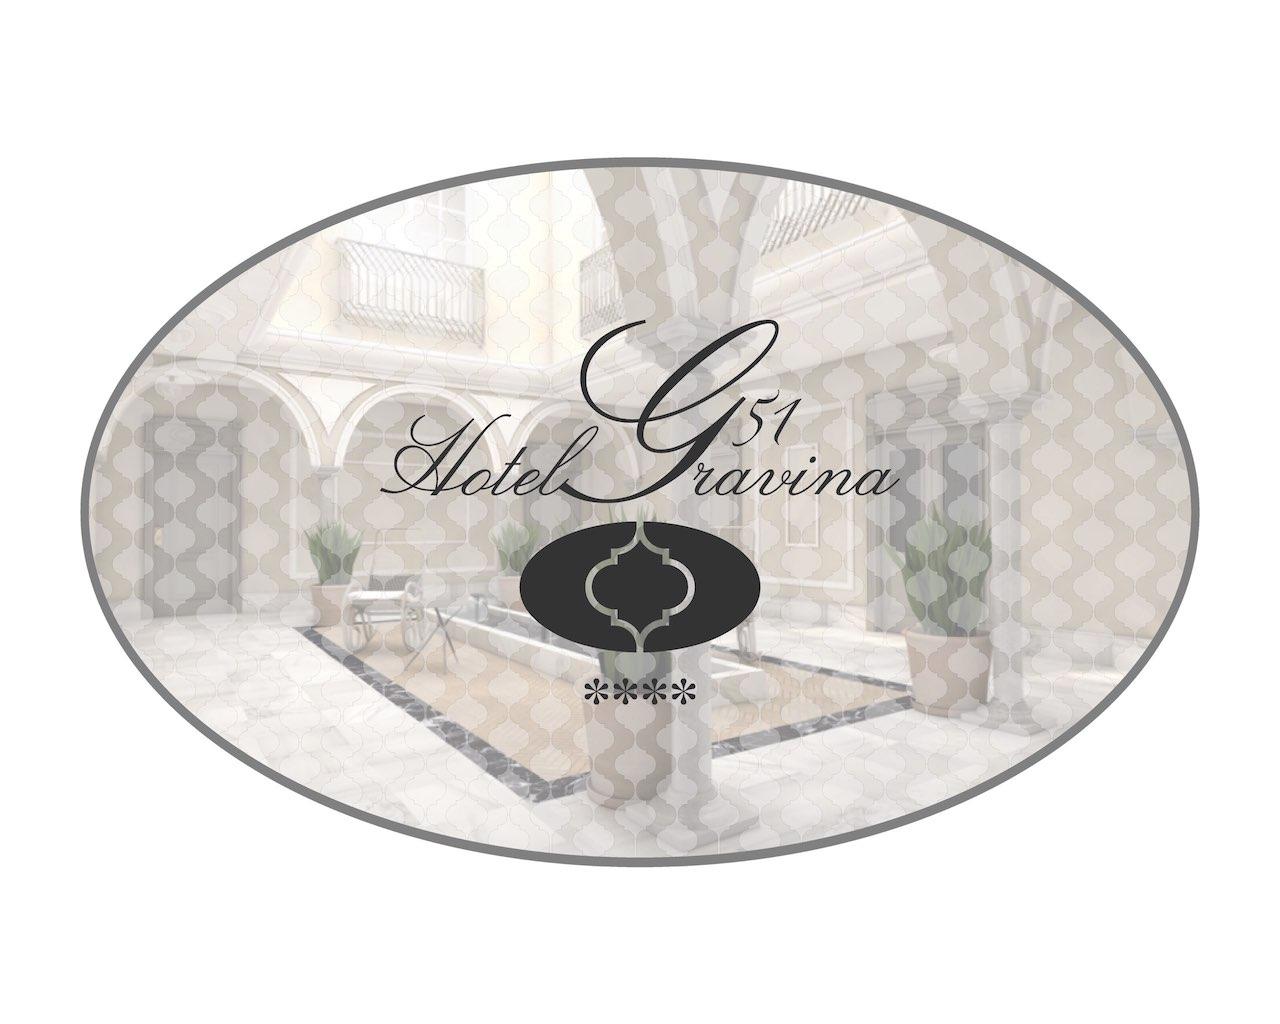 Fondo de pantalla 2560X2048. Hotel Gravina 51 - Hotel Gravina 51 | Identidad gráfica